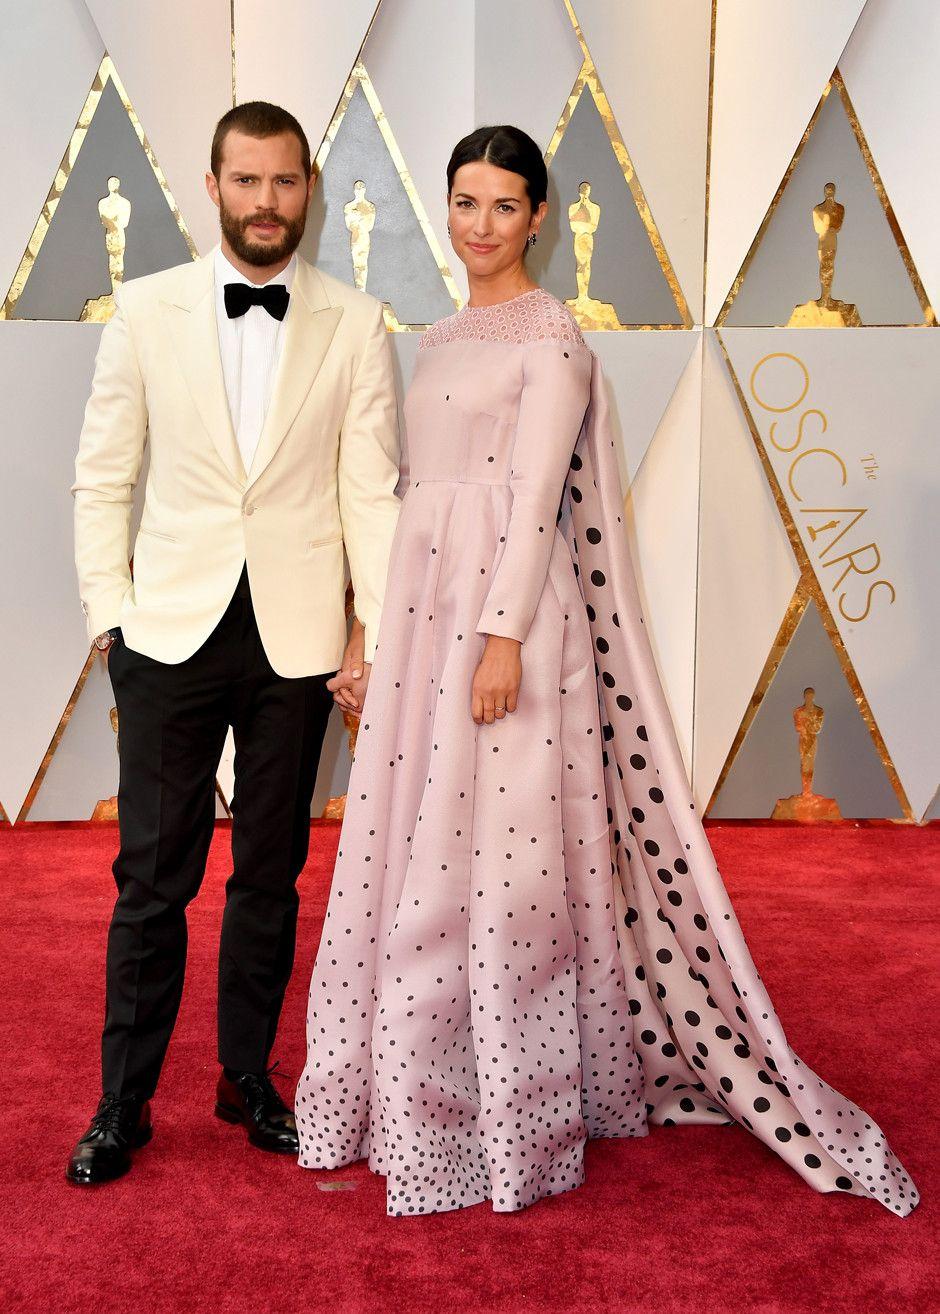 Джейми Дорнан и Амелия Уорнер | Gorgeous Couple | Pinterest